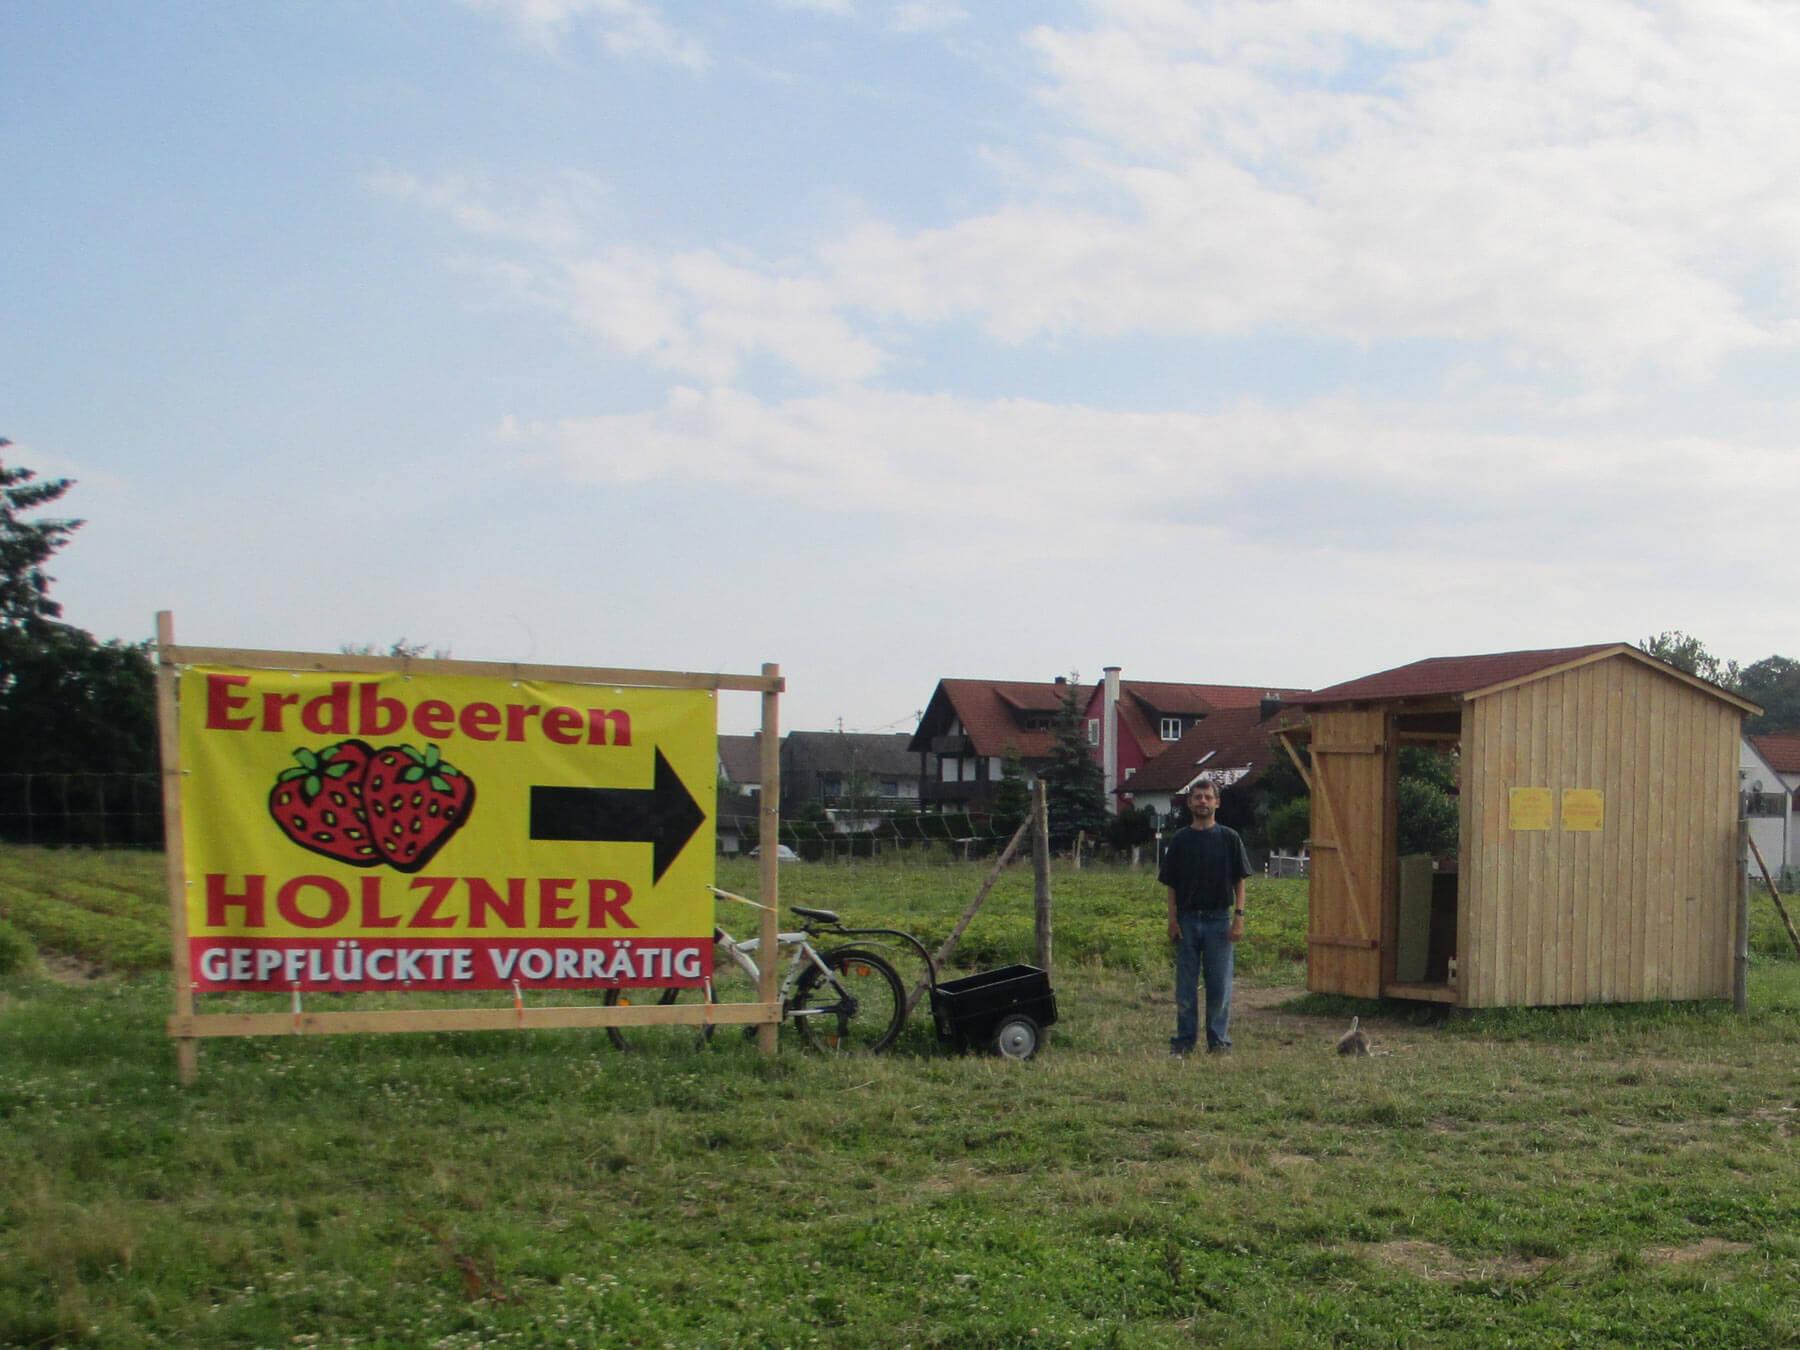 Erdbeerfeld Mainburg von Erdbeeren Holzner - Erdbeeren selbst pflücken bei Erdbeeren Holzner in Mainburg